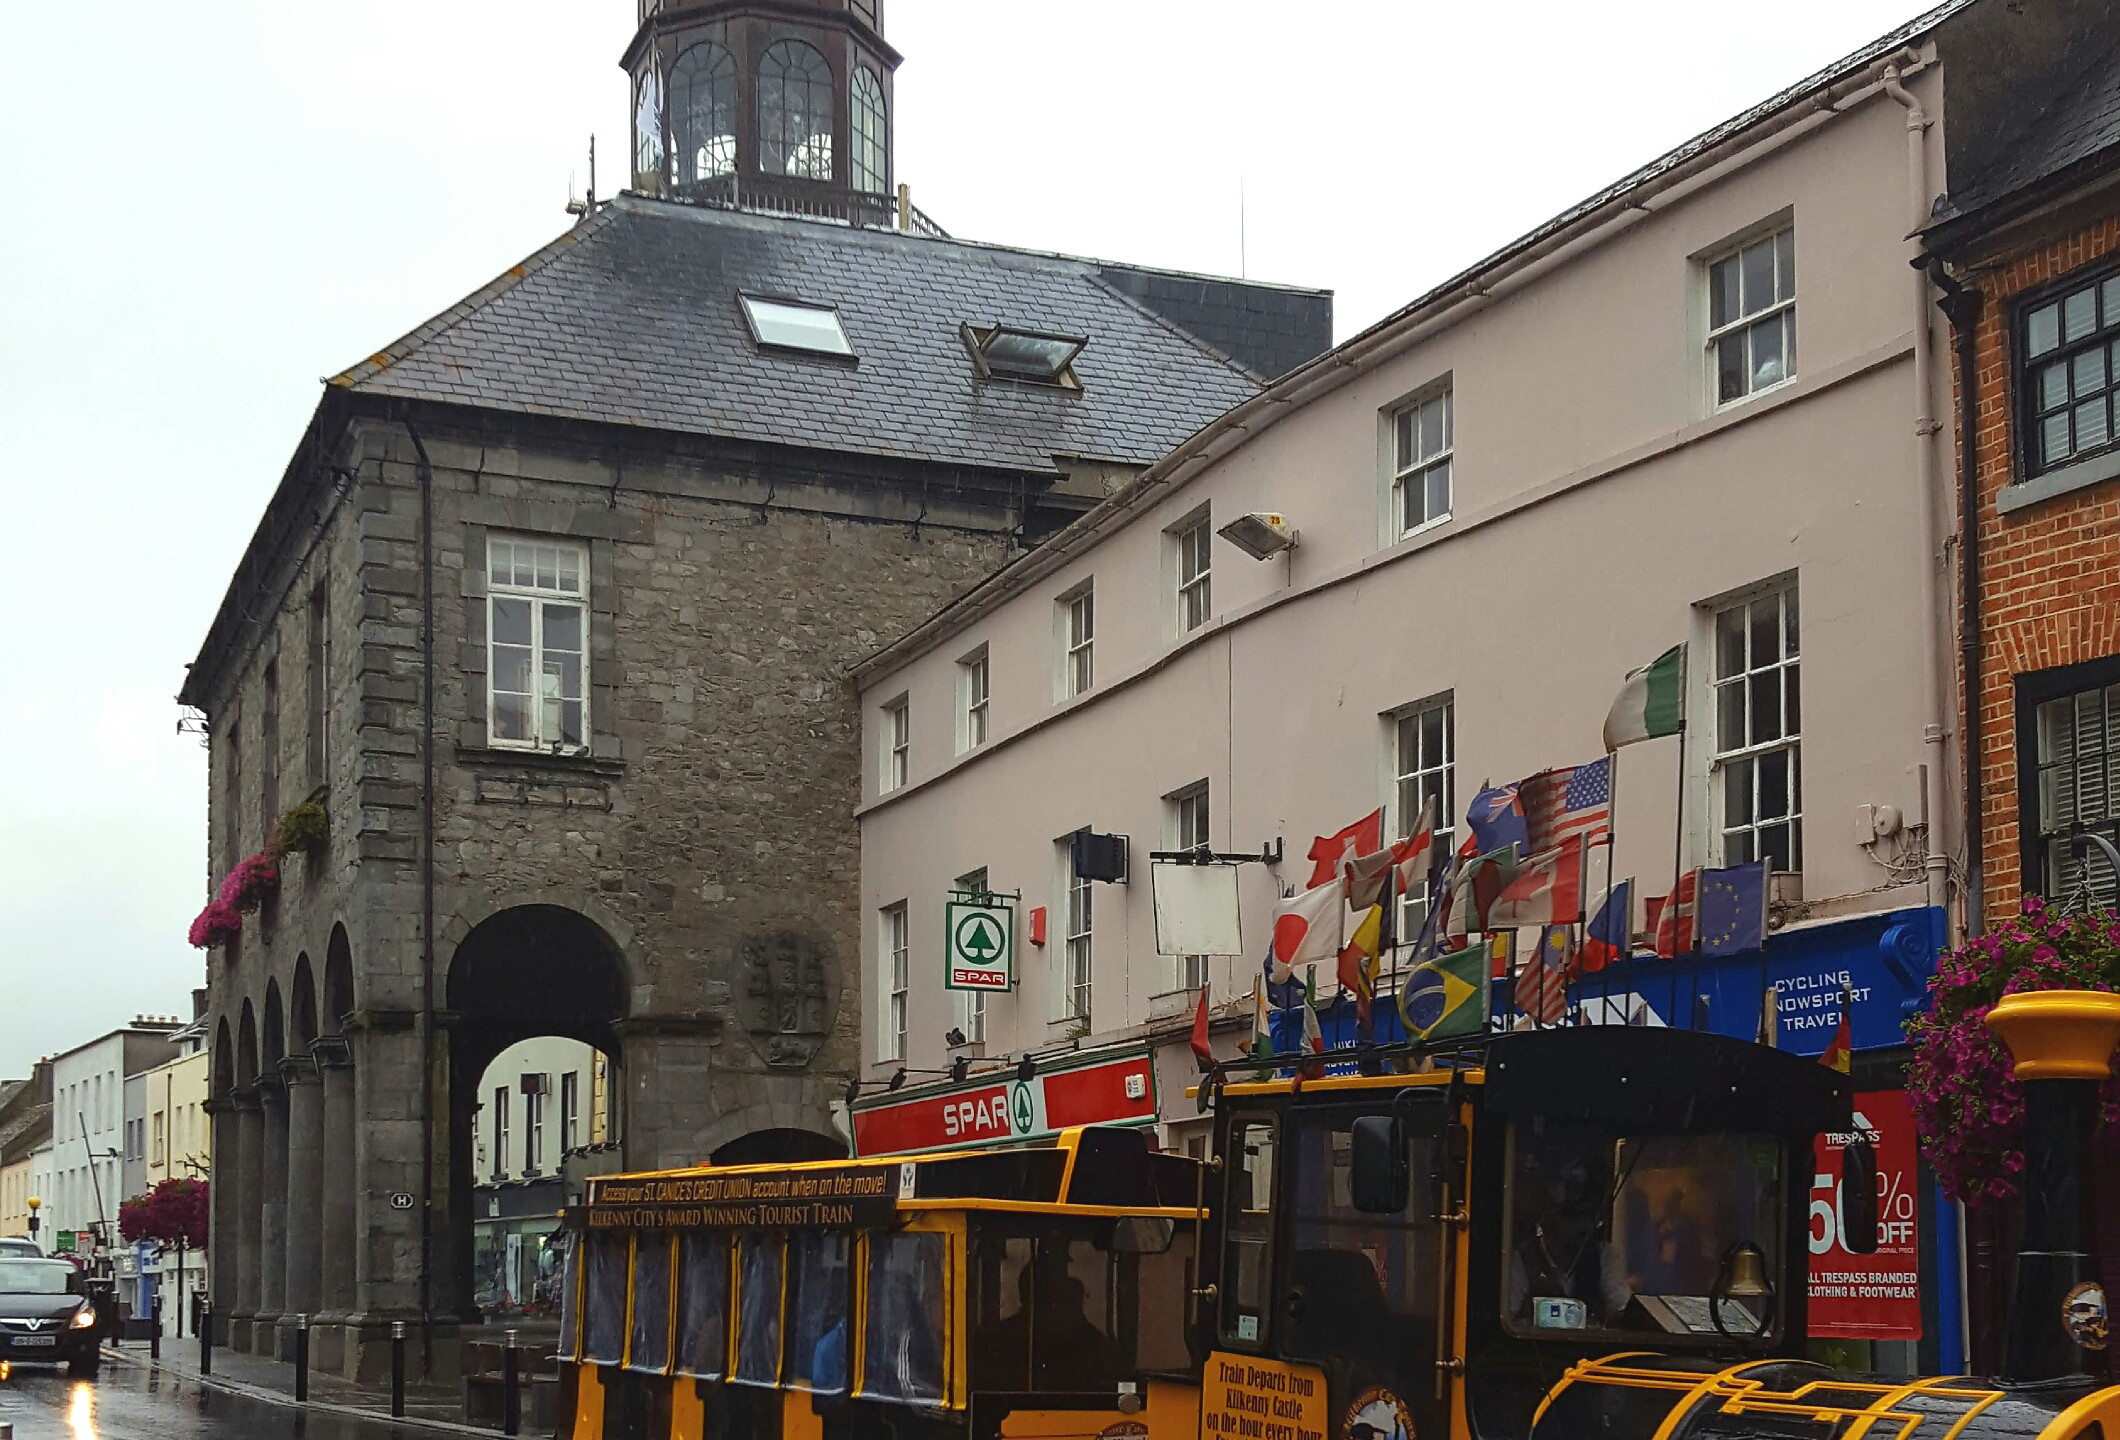 Getting around Kilkenny